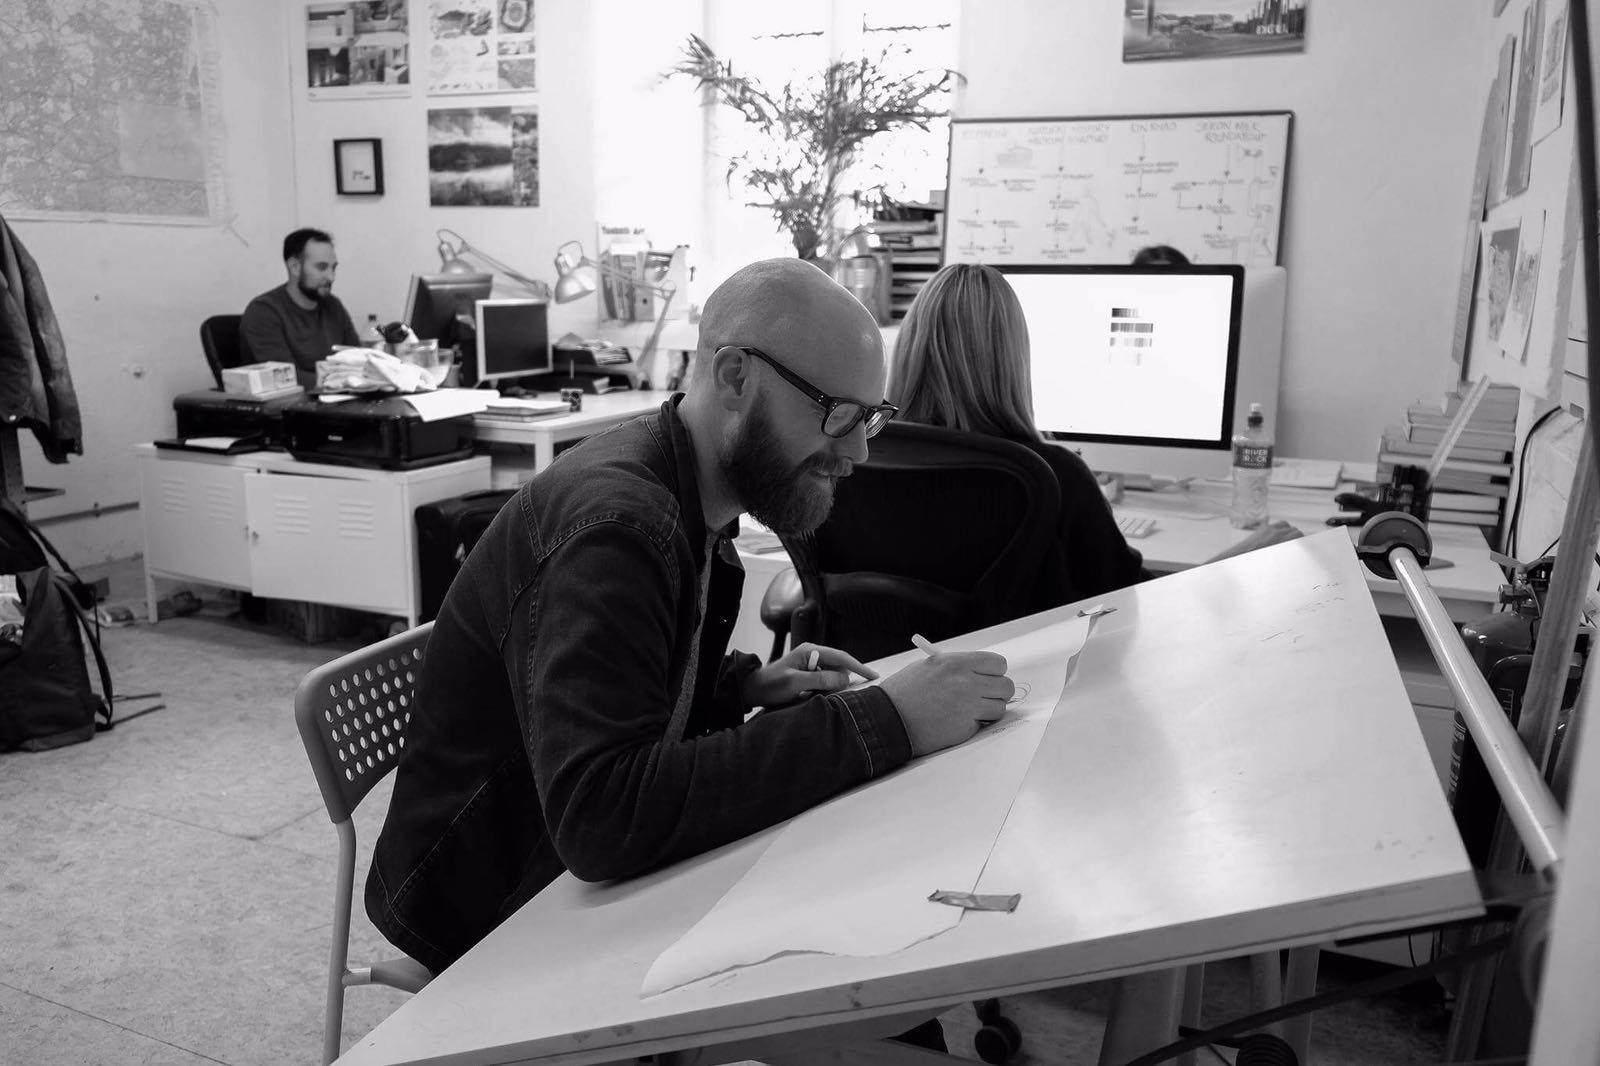 "ZAP TEAM:    Chirag Patel  – University of Sheffield (BA Architecture), Central Saint Martins School of Art   Serina Kitazono – University of Sheffield (BA Architecture)   Andres Hurtado – Universidad de Ibagué , Colombia (MArchD)   Adelina Nedelcu – Cardiff University (MArch)   Sasha Userdnaja –Paris School of Architecture ""Paris val de Seine"", Greenwich University (MArch)   Andreas Schmid -ETH Zürich, Switzerland (MArch)   Elif Ergisi  - Chelsea College of Arts, London (MA Interior and Spatial design, BA in LLB Law Degree )"